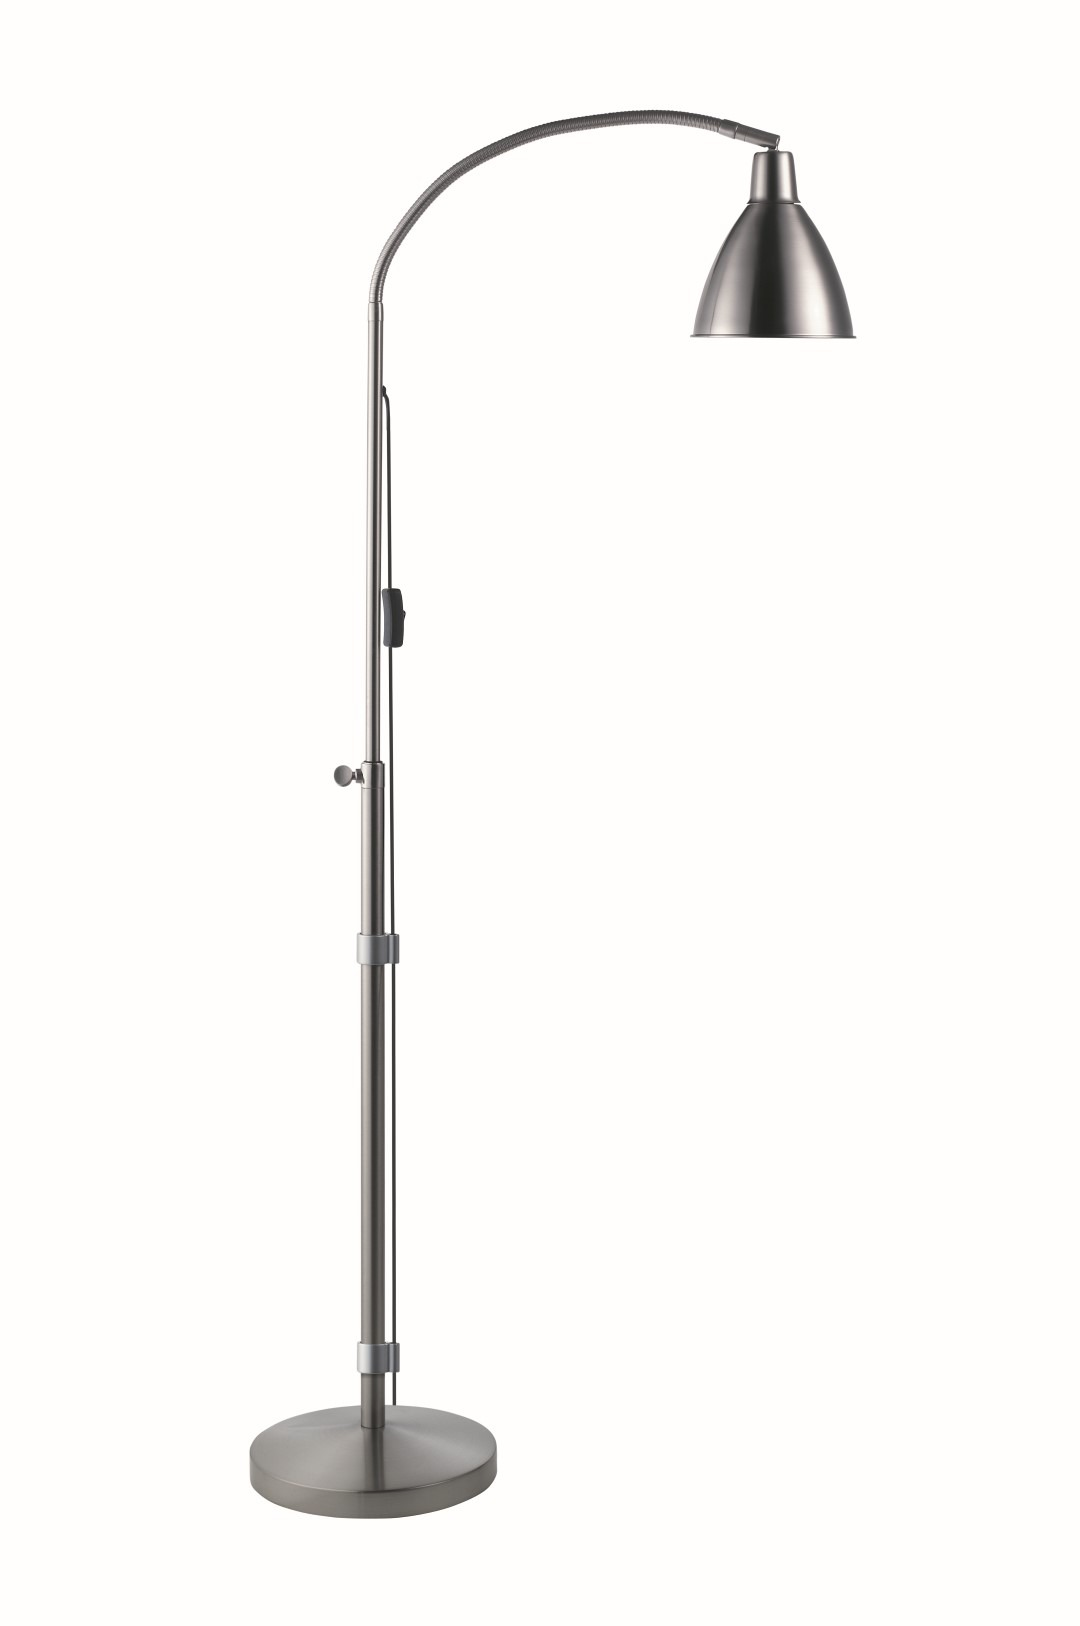 Daylight Flexi-Vision Floor Lamp - Heamar Company Limited